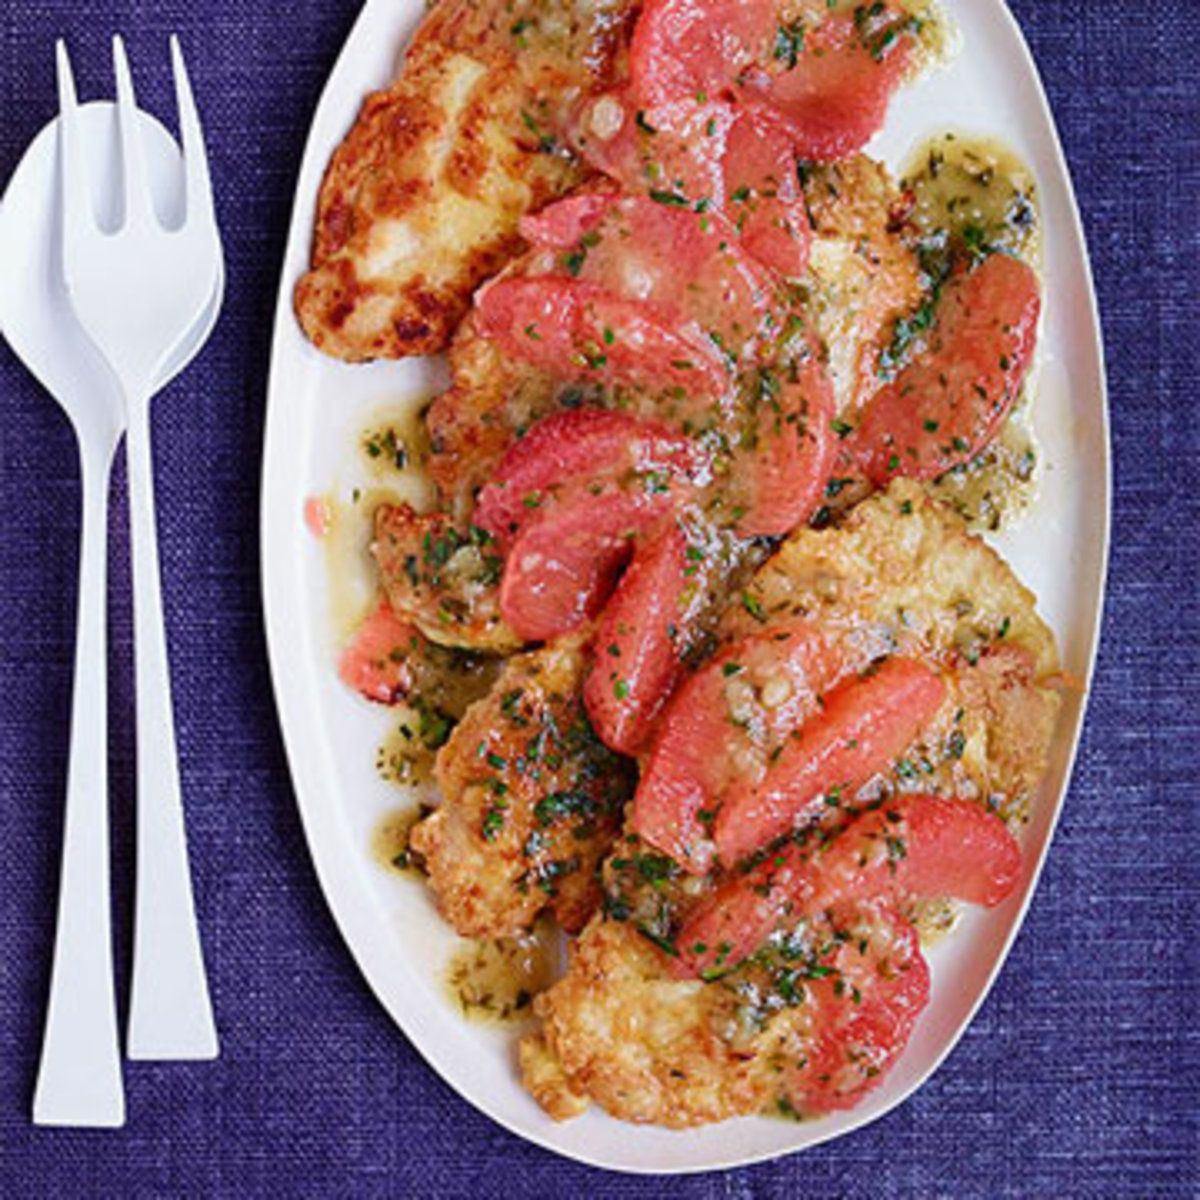 Chicken Francese With Grapefruit Tarragon Sauce Recipe Chicken Francese Grapefruit Recipes Chicken